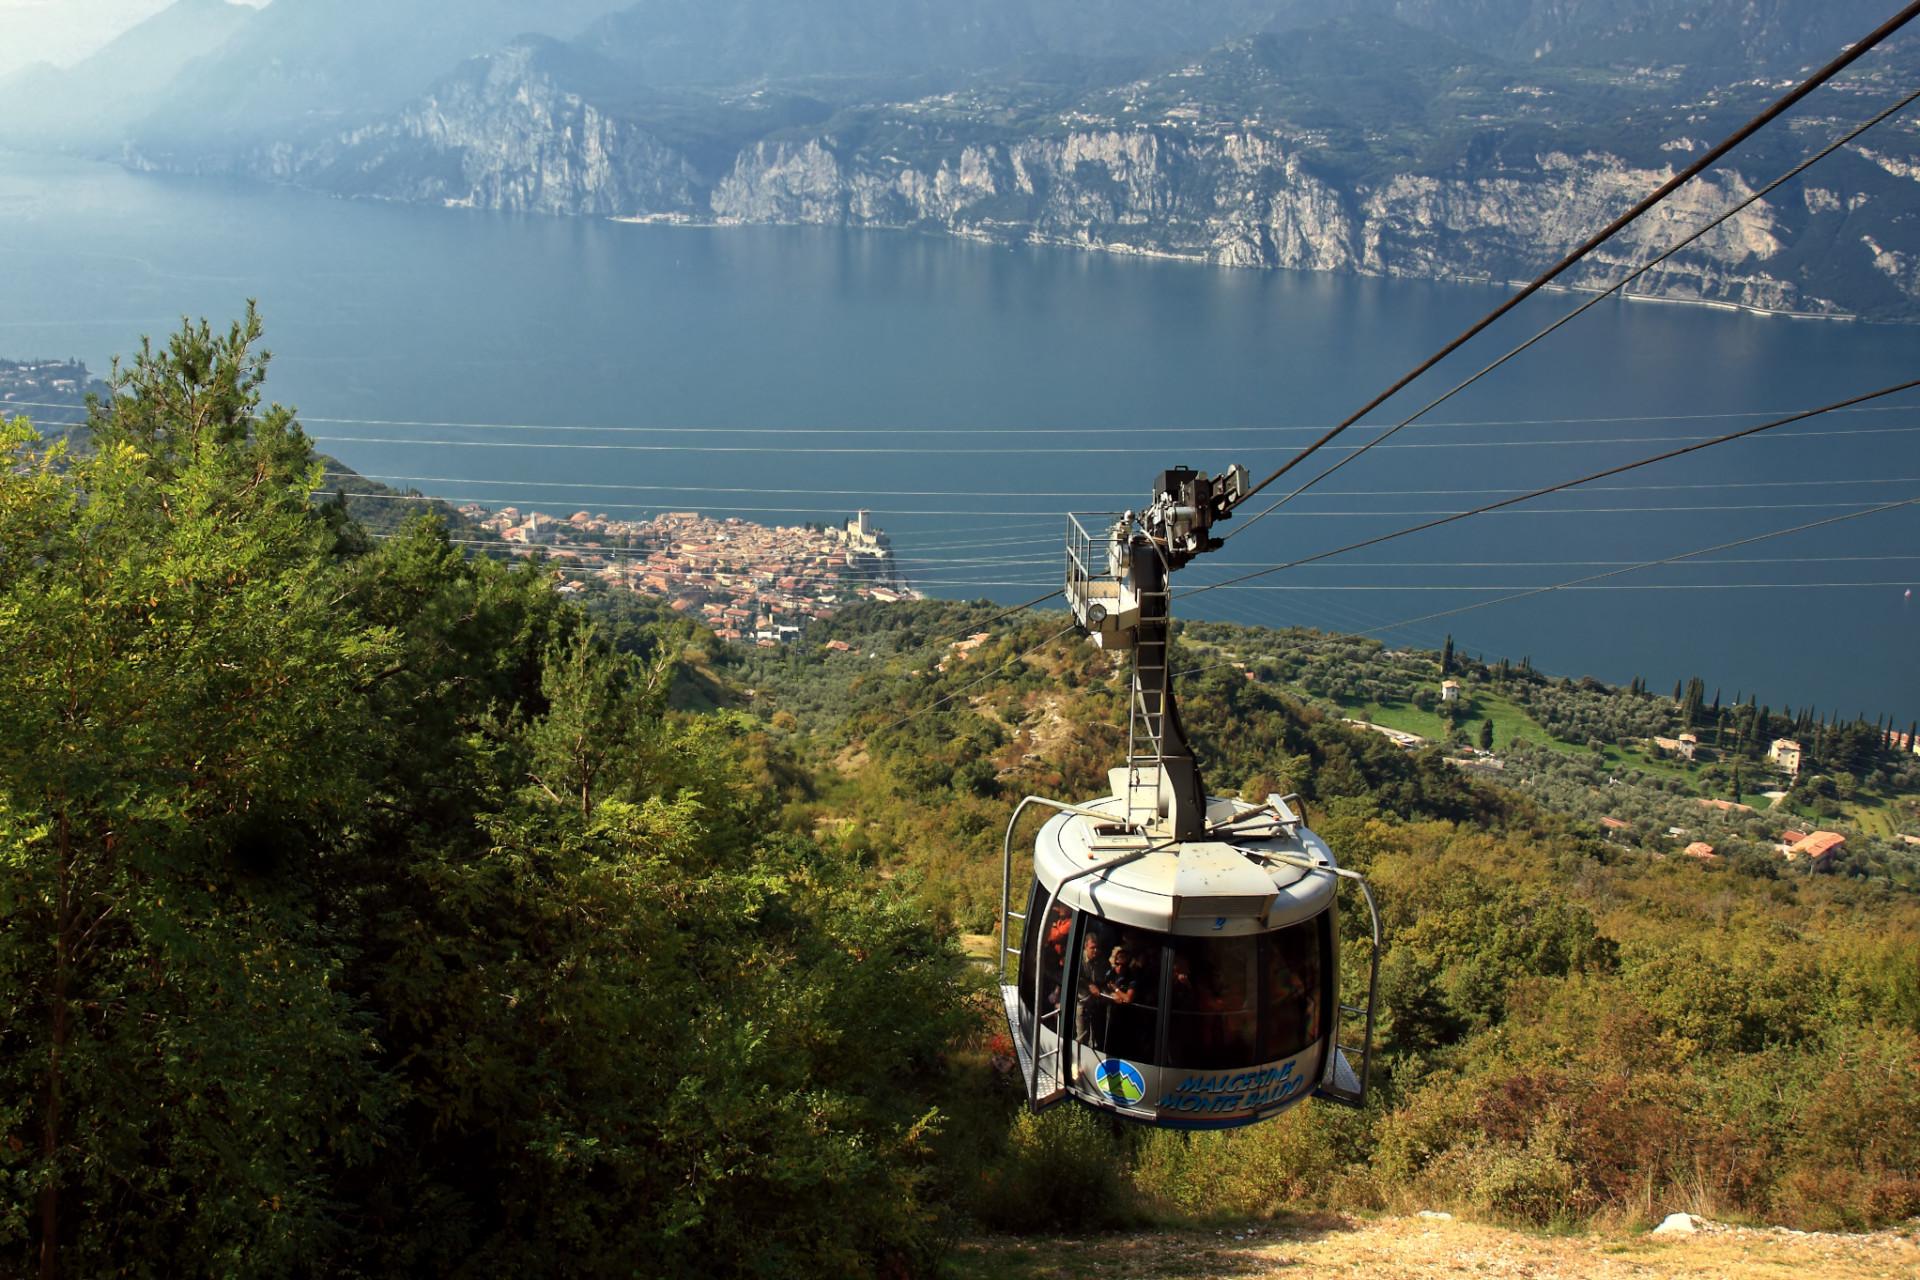 Monte Baldo Seilbahn Malcesine Gardasee